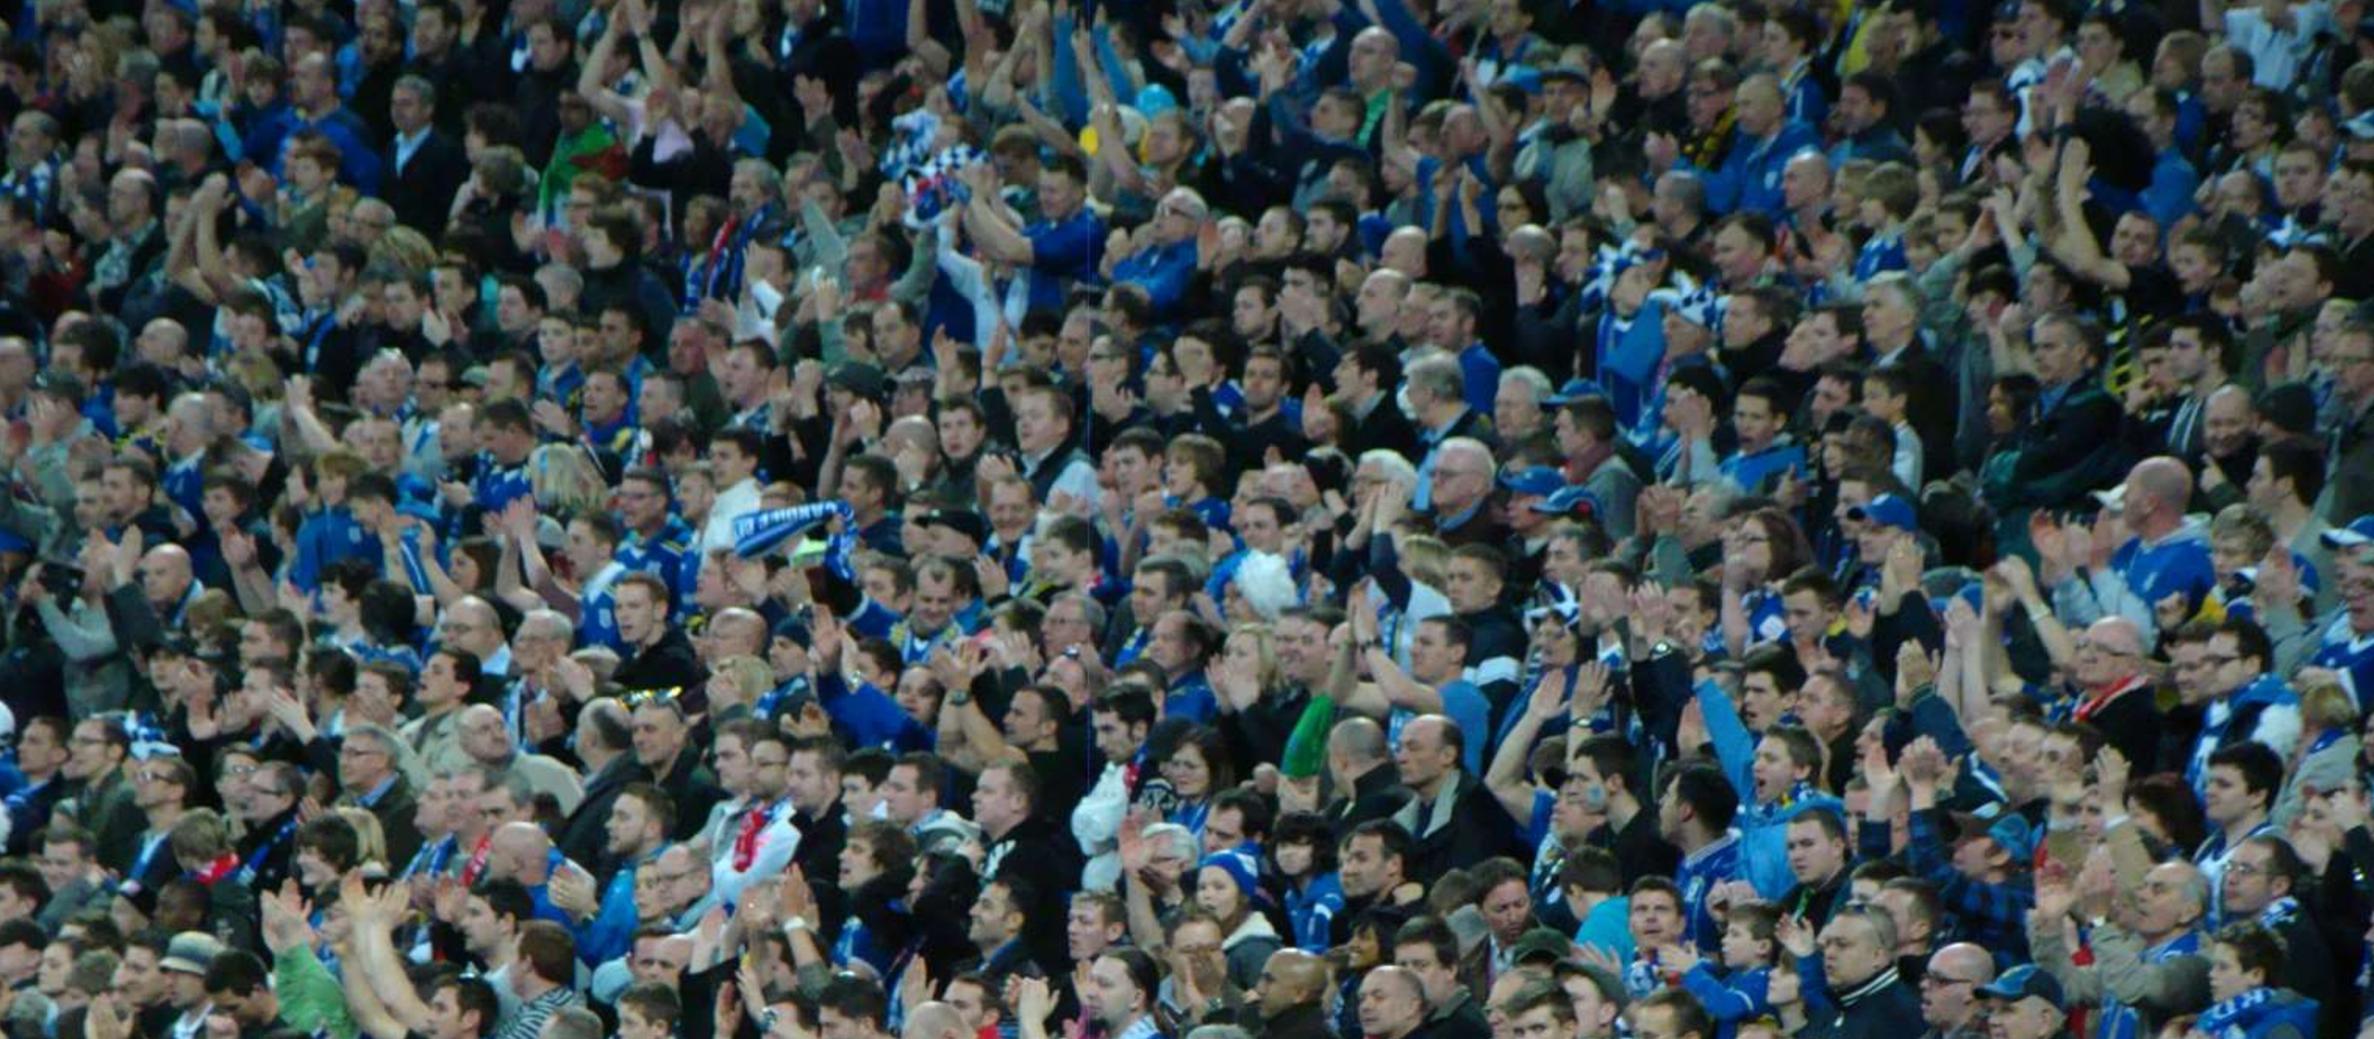 UK: Cardiff City resists petition to boycott Israeli match